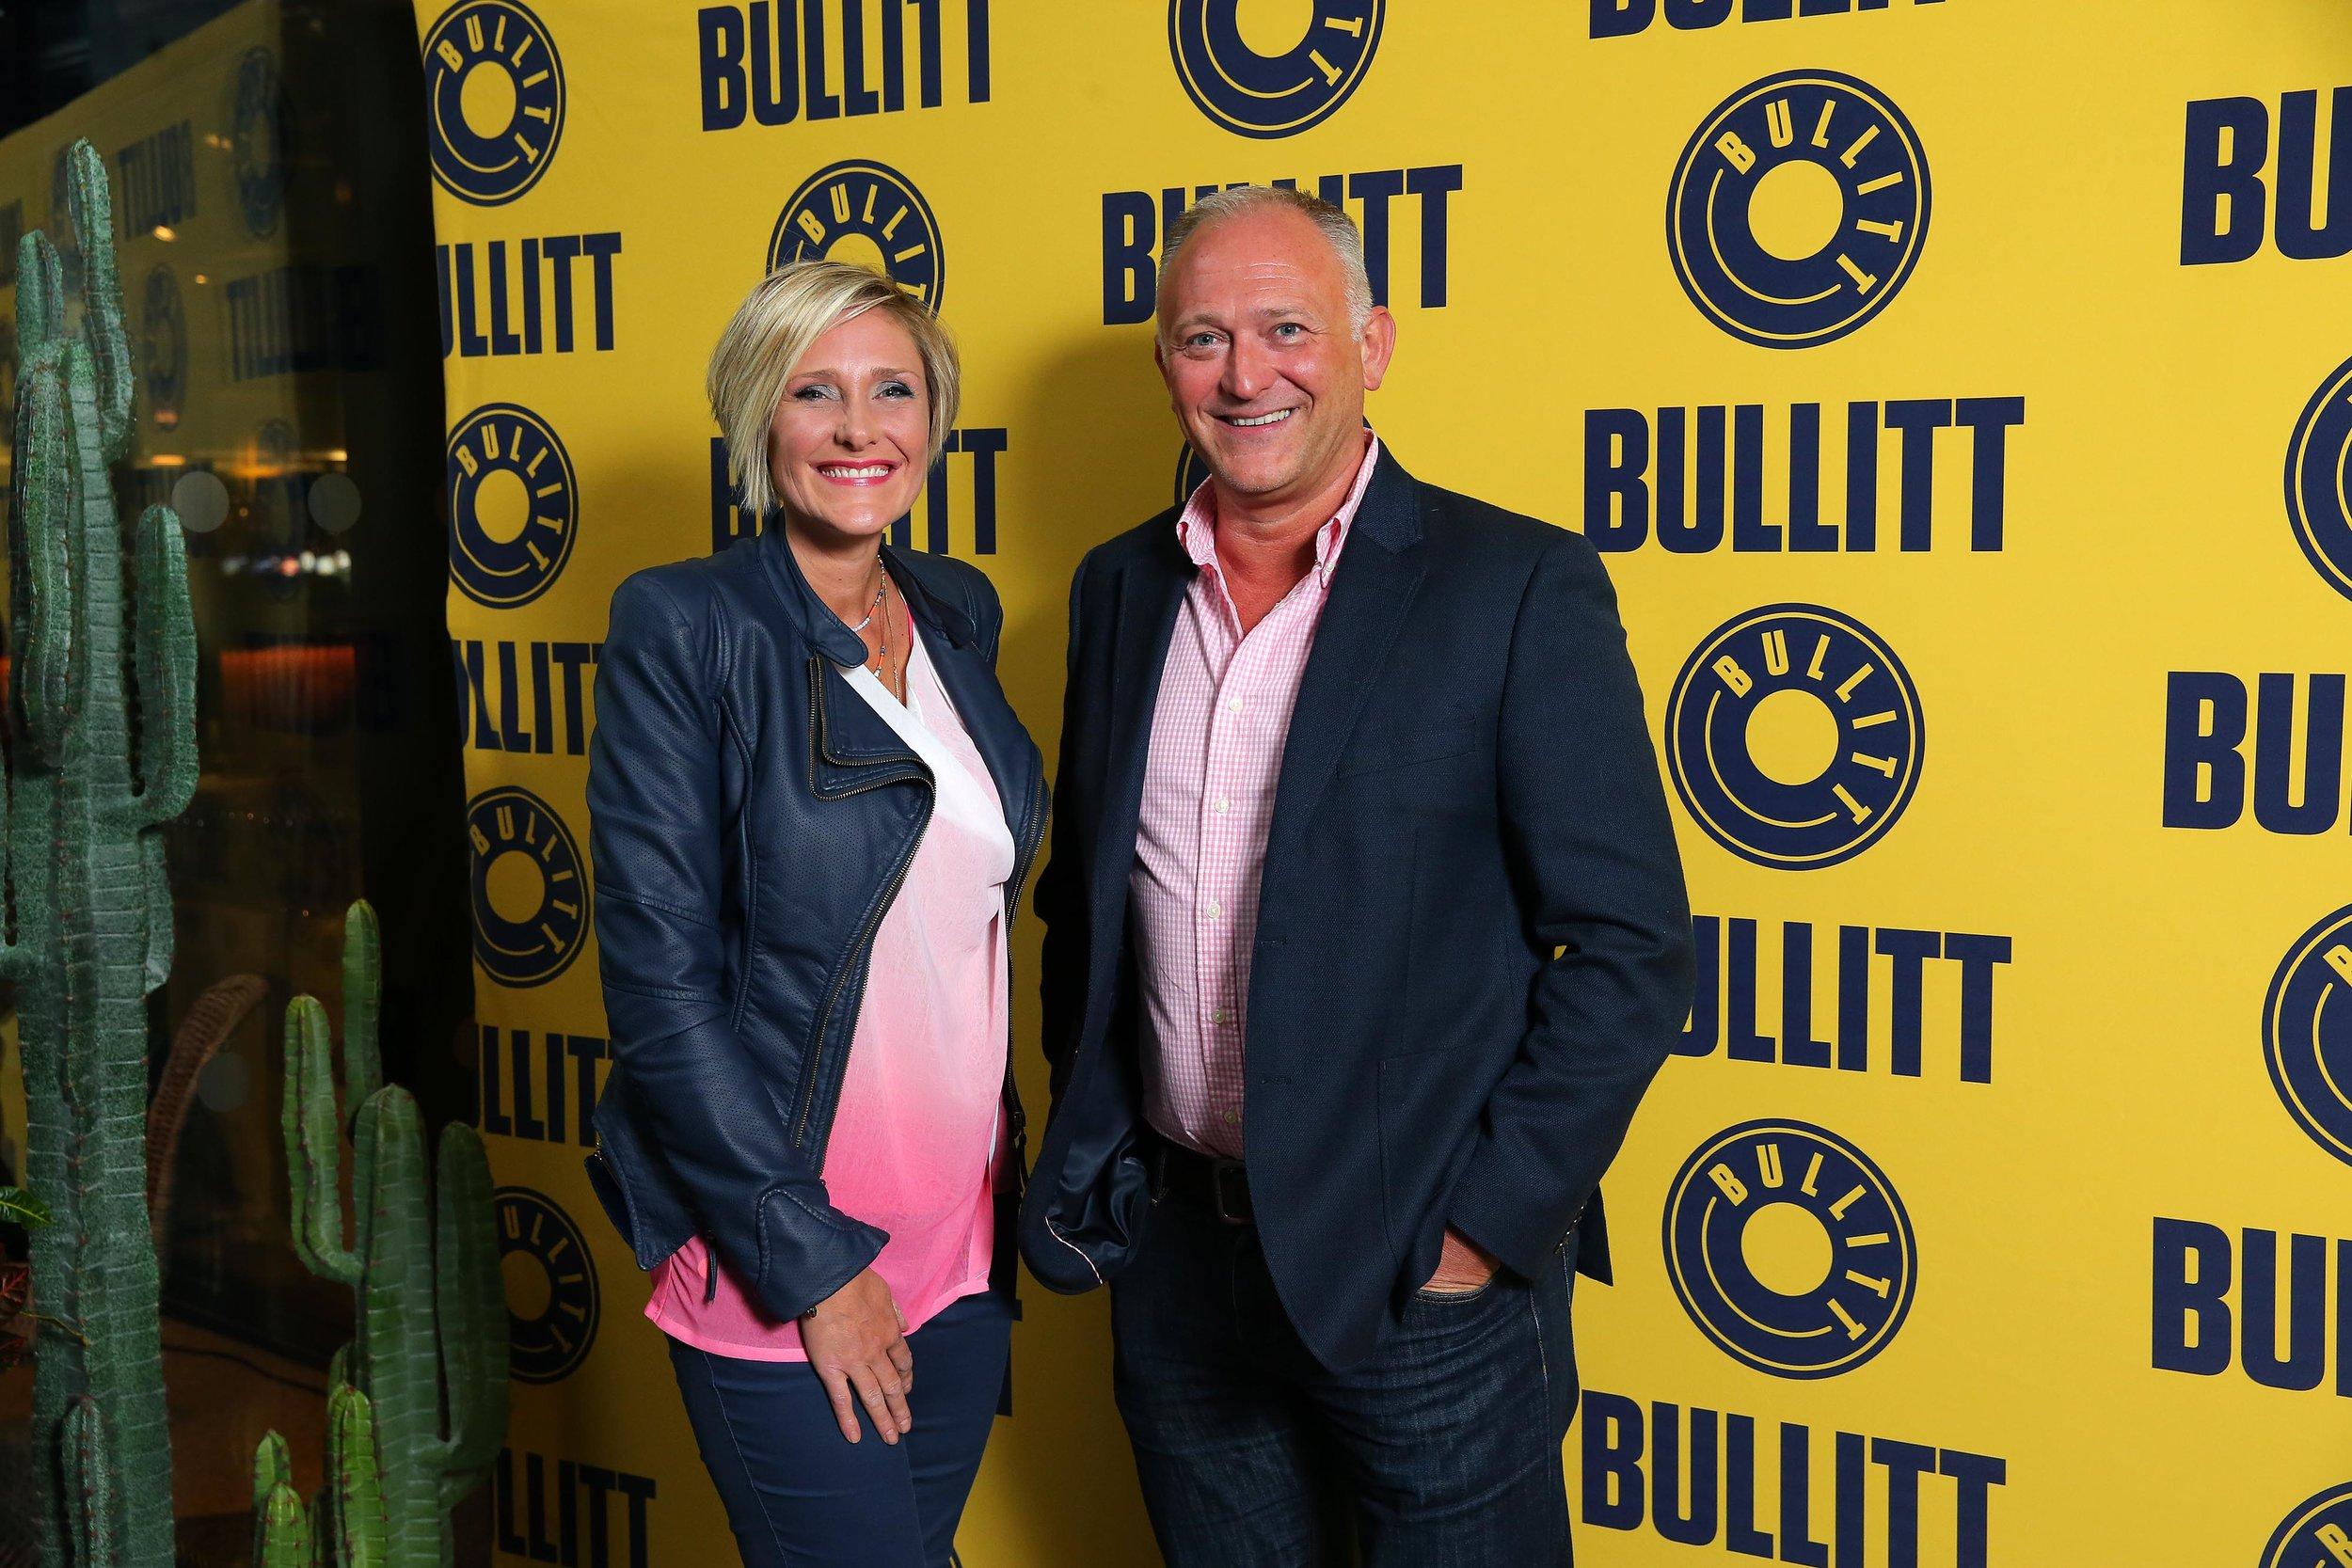 Bullitt Launch Socials 05.JPG